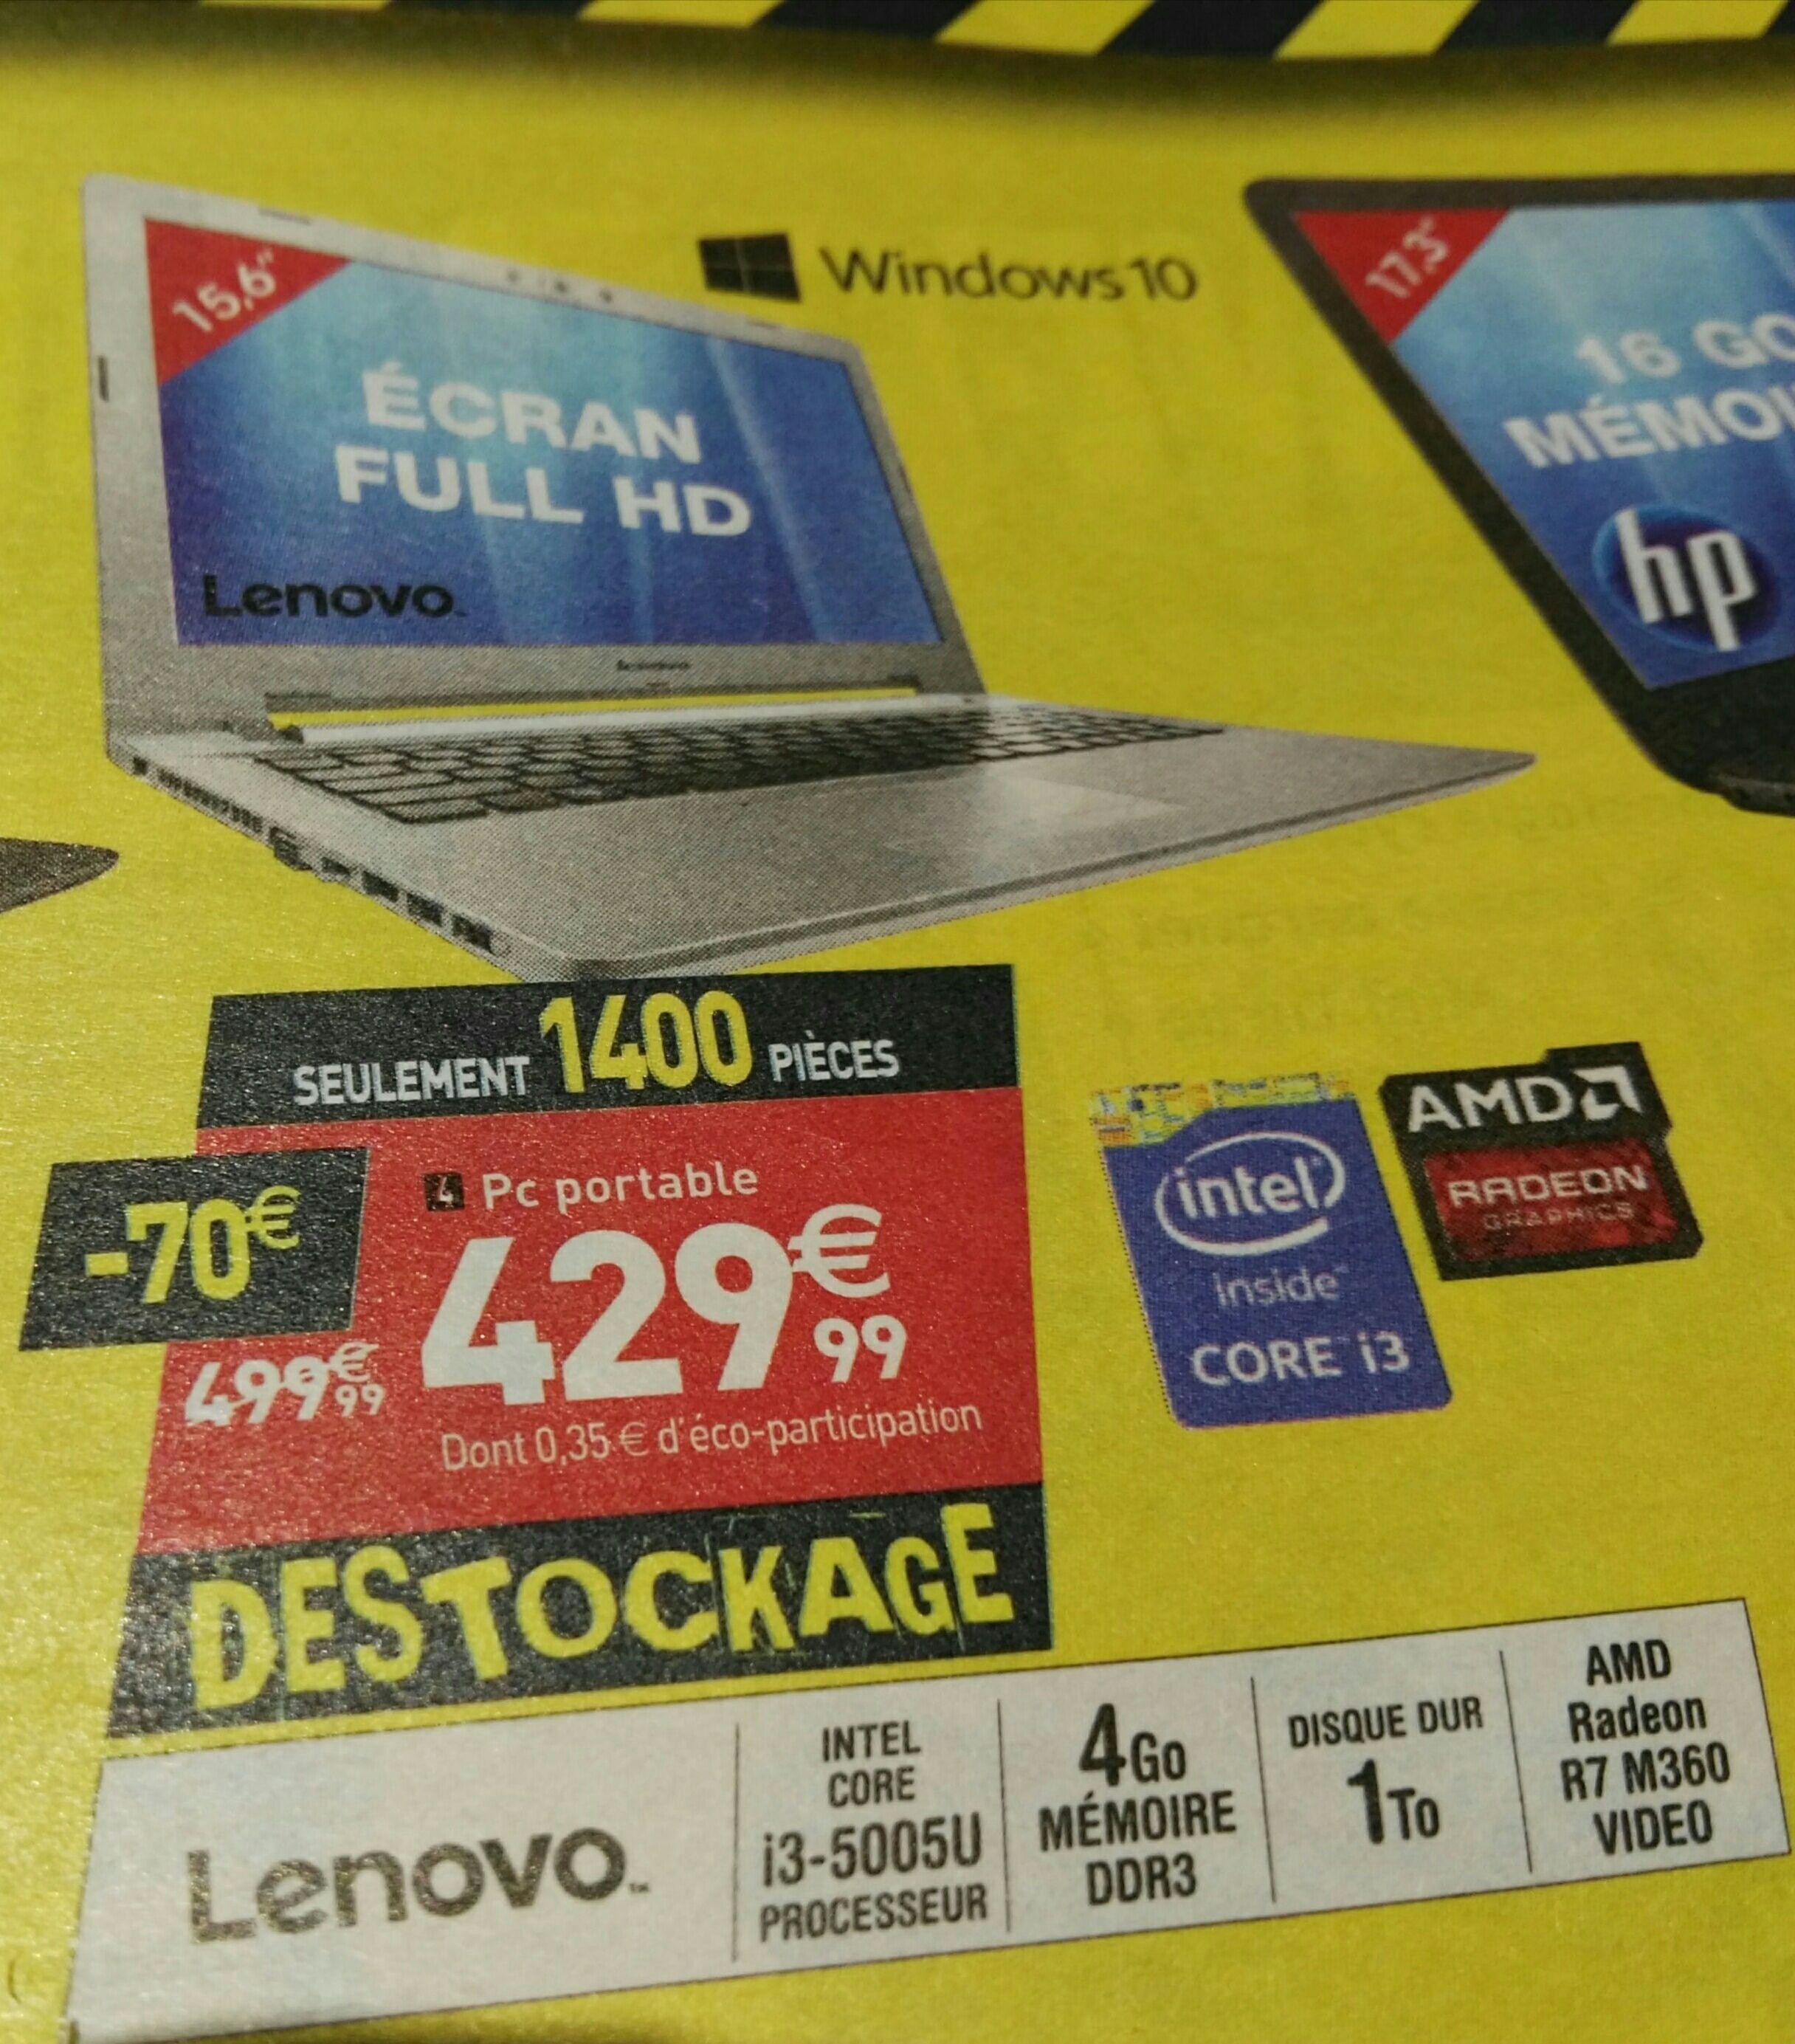 "PC Portable 15.6"" Full HD Lenovo Z51-70 80K601AGFR (i3-5005u, 4 Go RAM, 1 To HDD, R7 M360, Windows 10)"